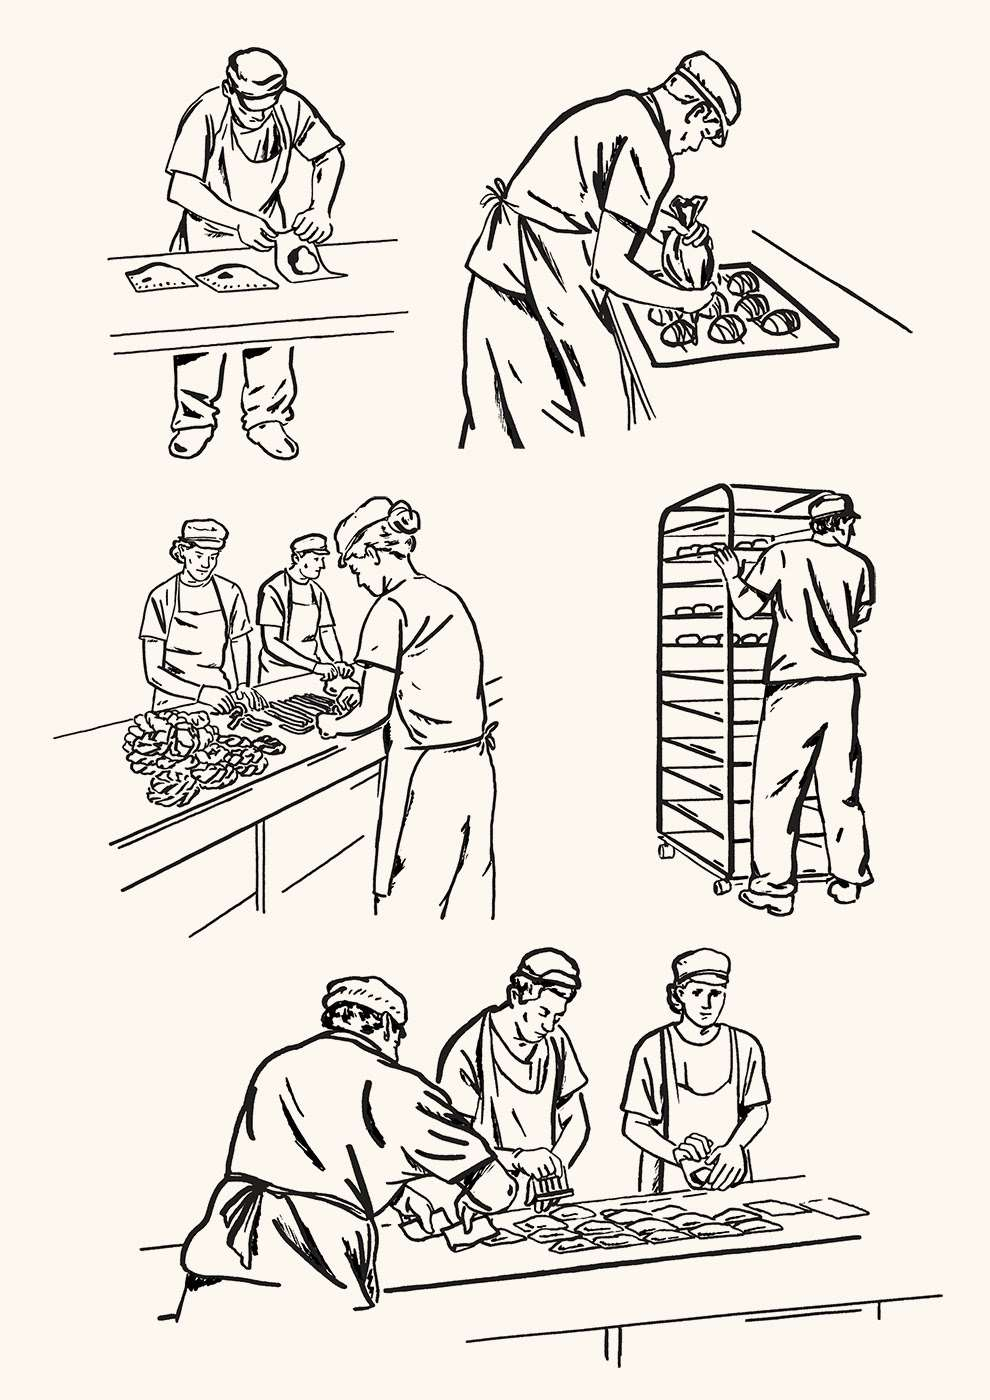 Harry Tennant, Line illustration of bakery process